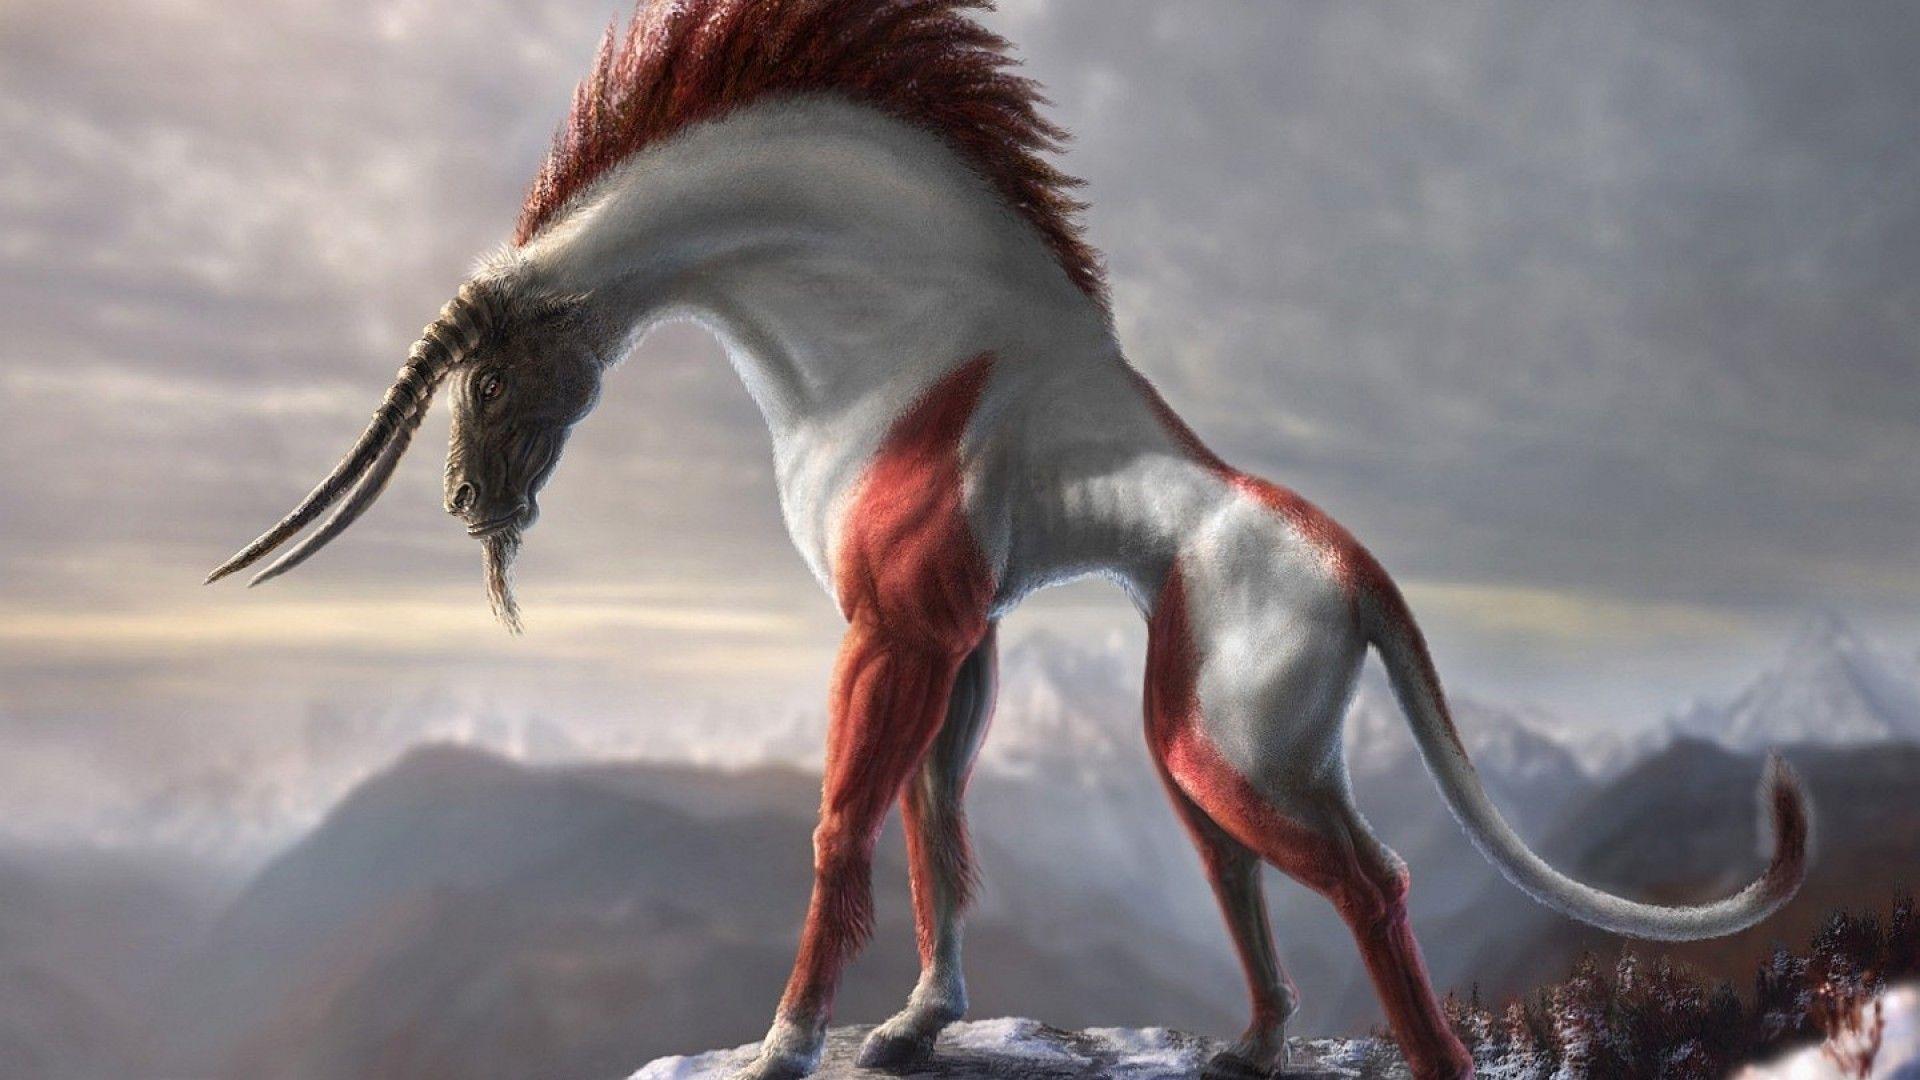 creature illustration in style pinterest fantasy creatures